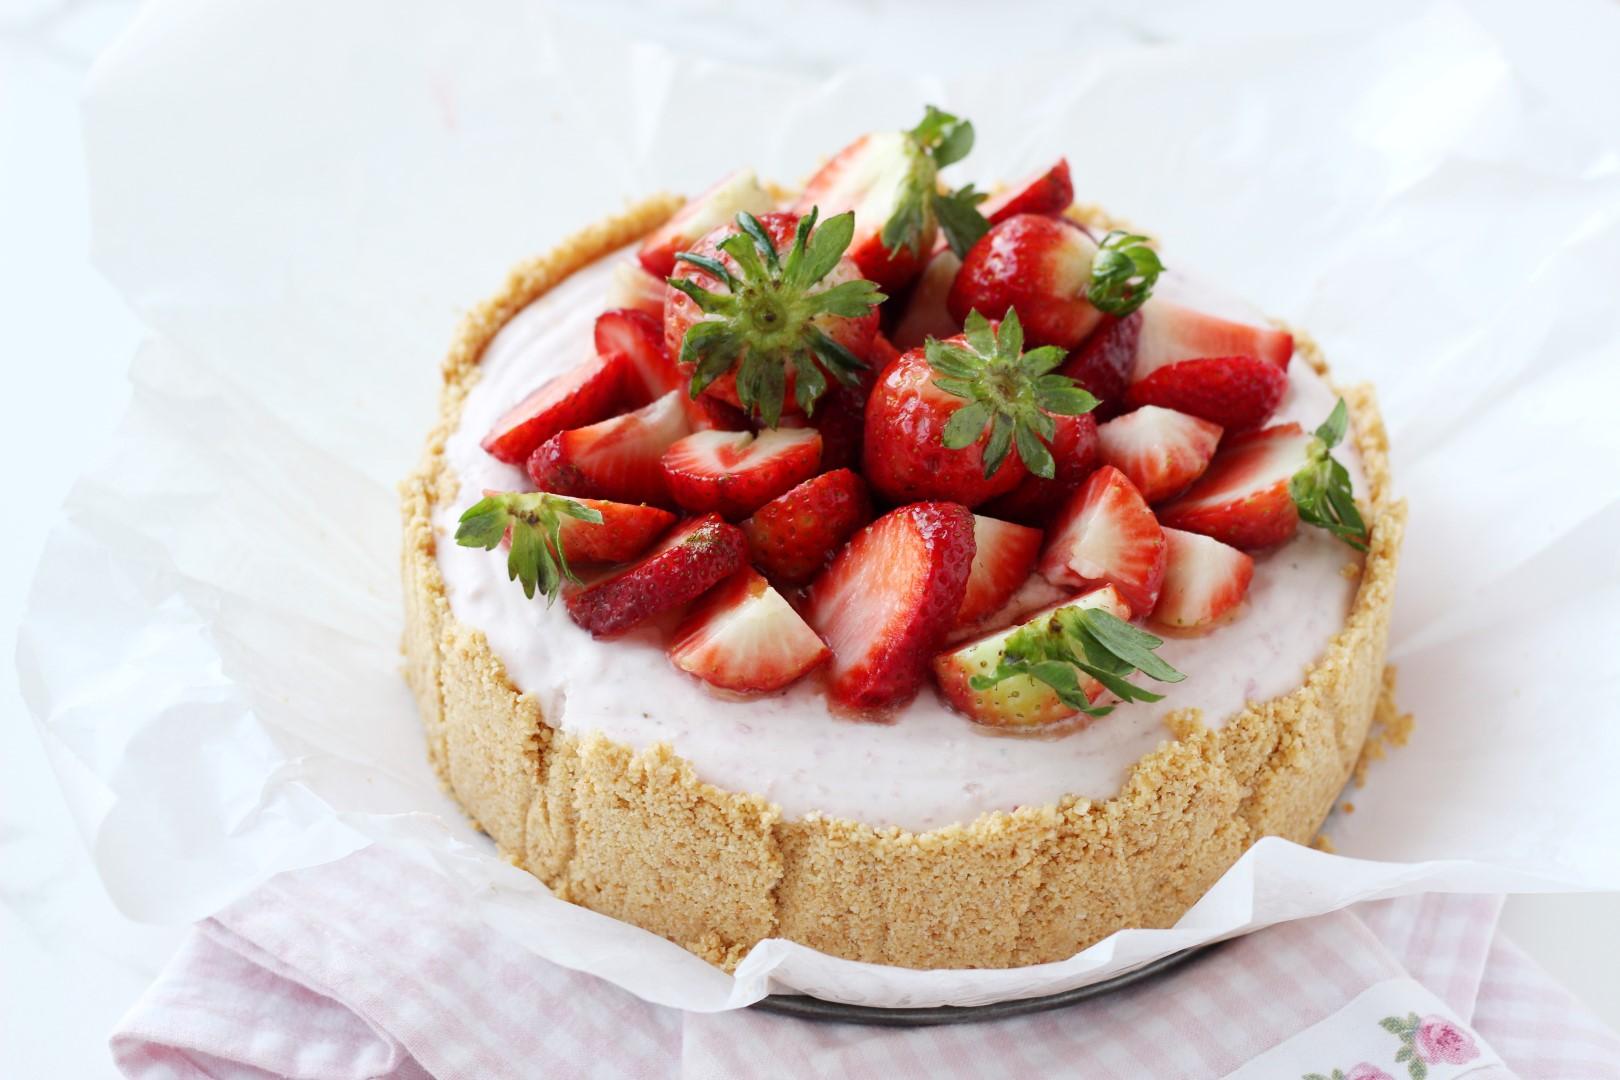 cheesecake de frutillas, receta mousse, casancrem, recetas de cocina, postre